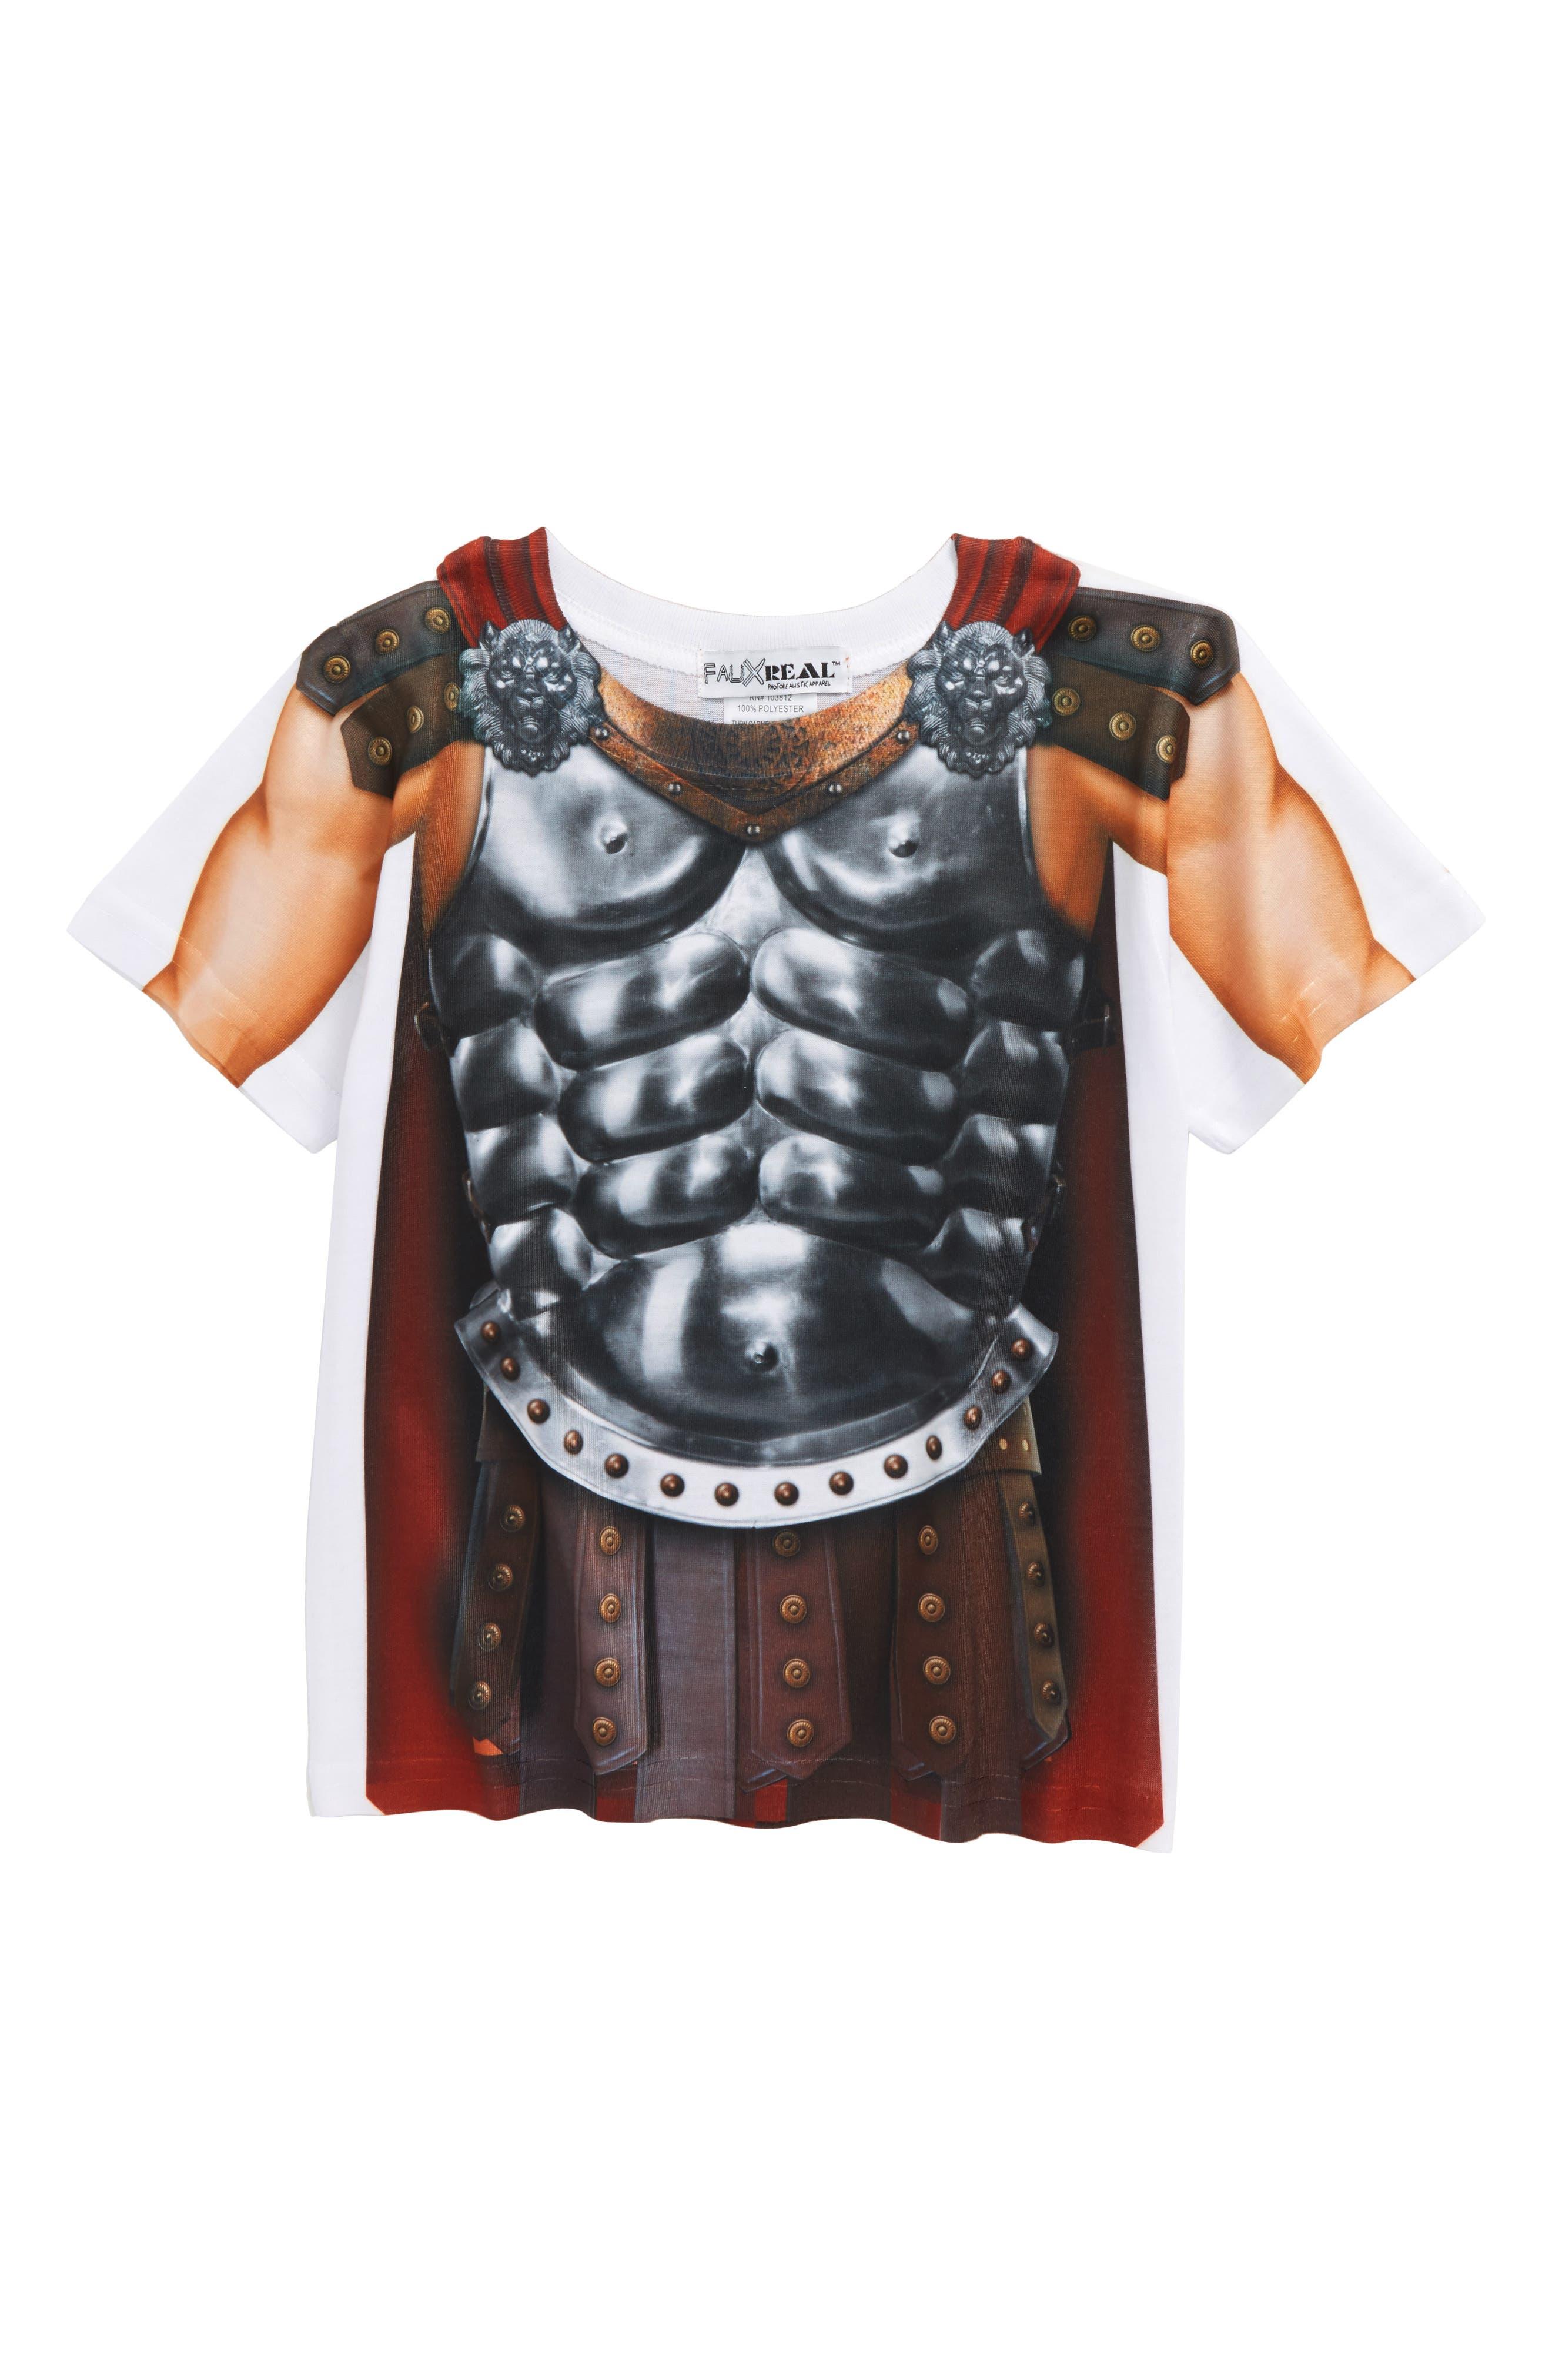 Main Image - Faux Real Gladiator Screenprint T-Shirt (Toddler Boys)